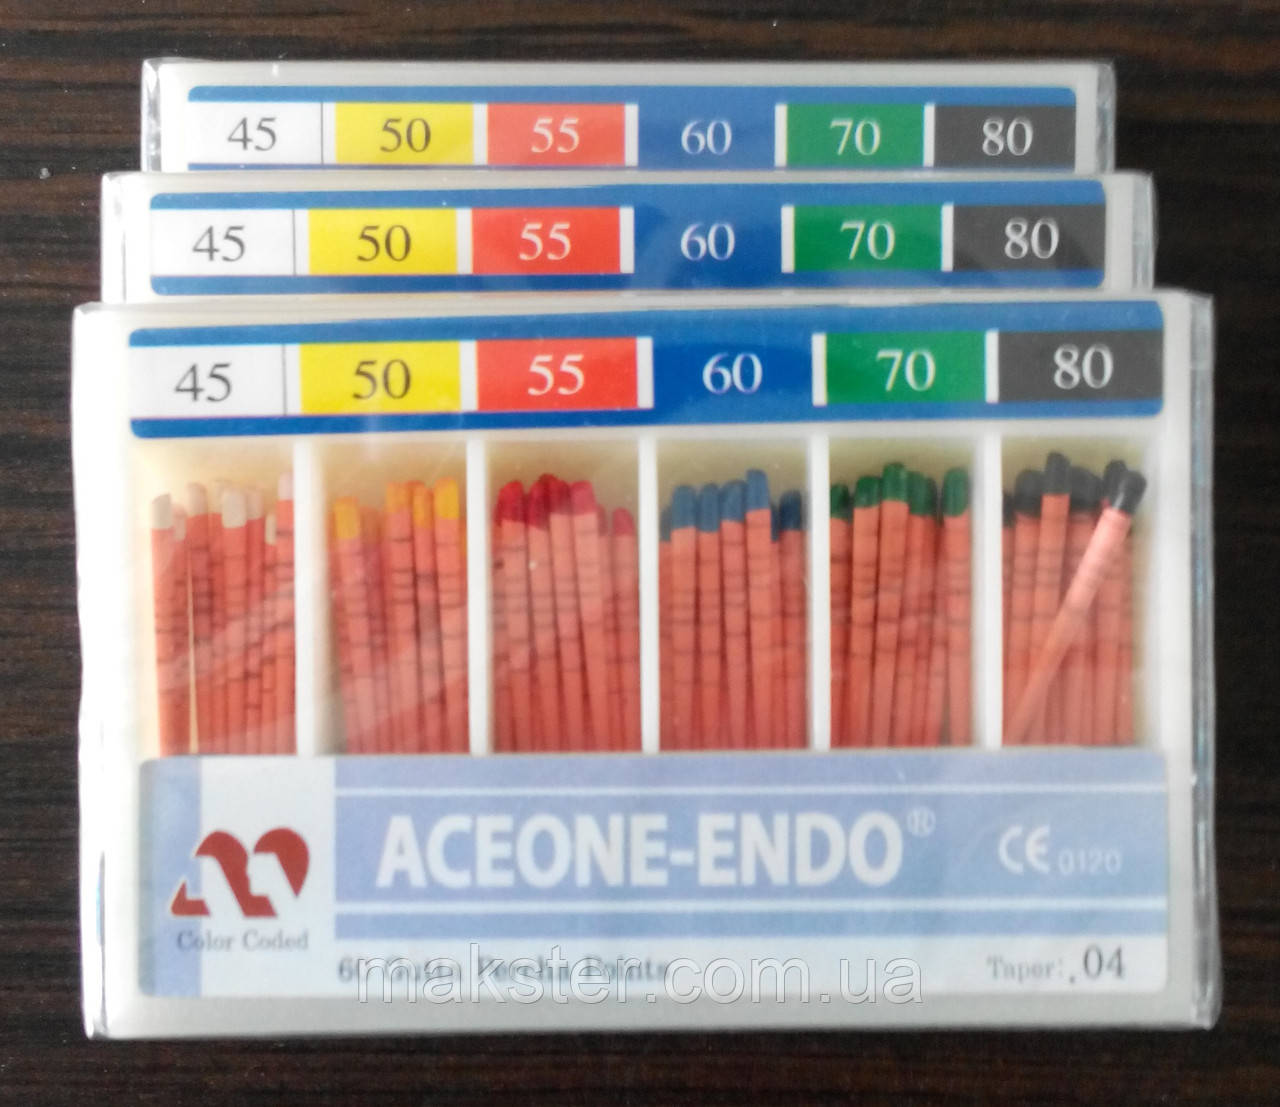 Штифты гуттаперчивые Aceone-Endo 04 №45-80